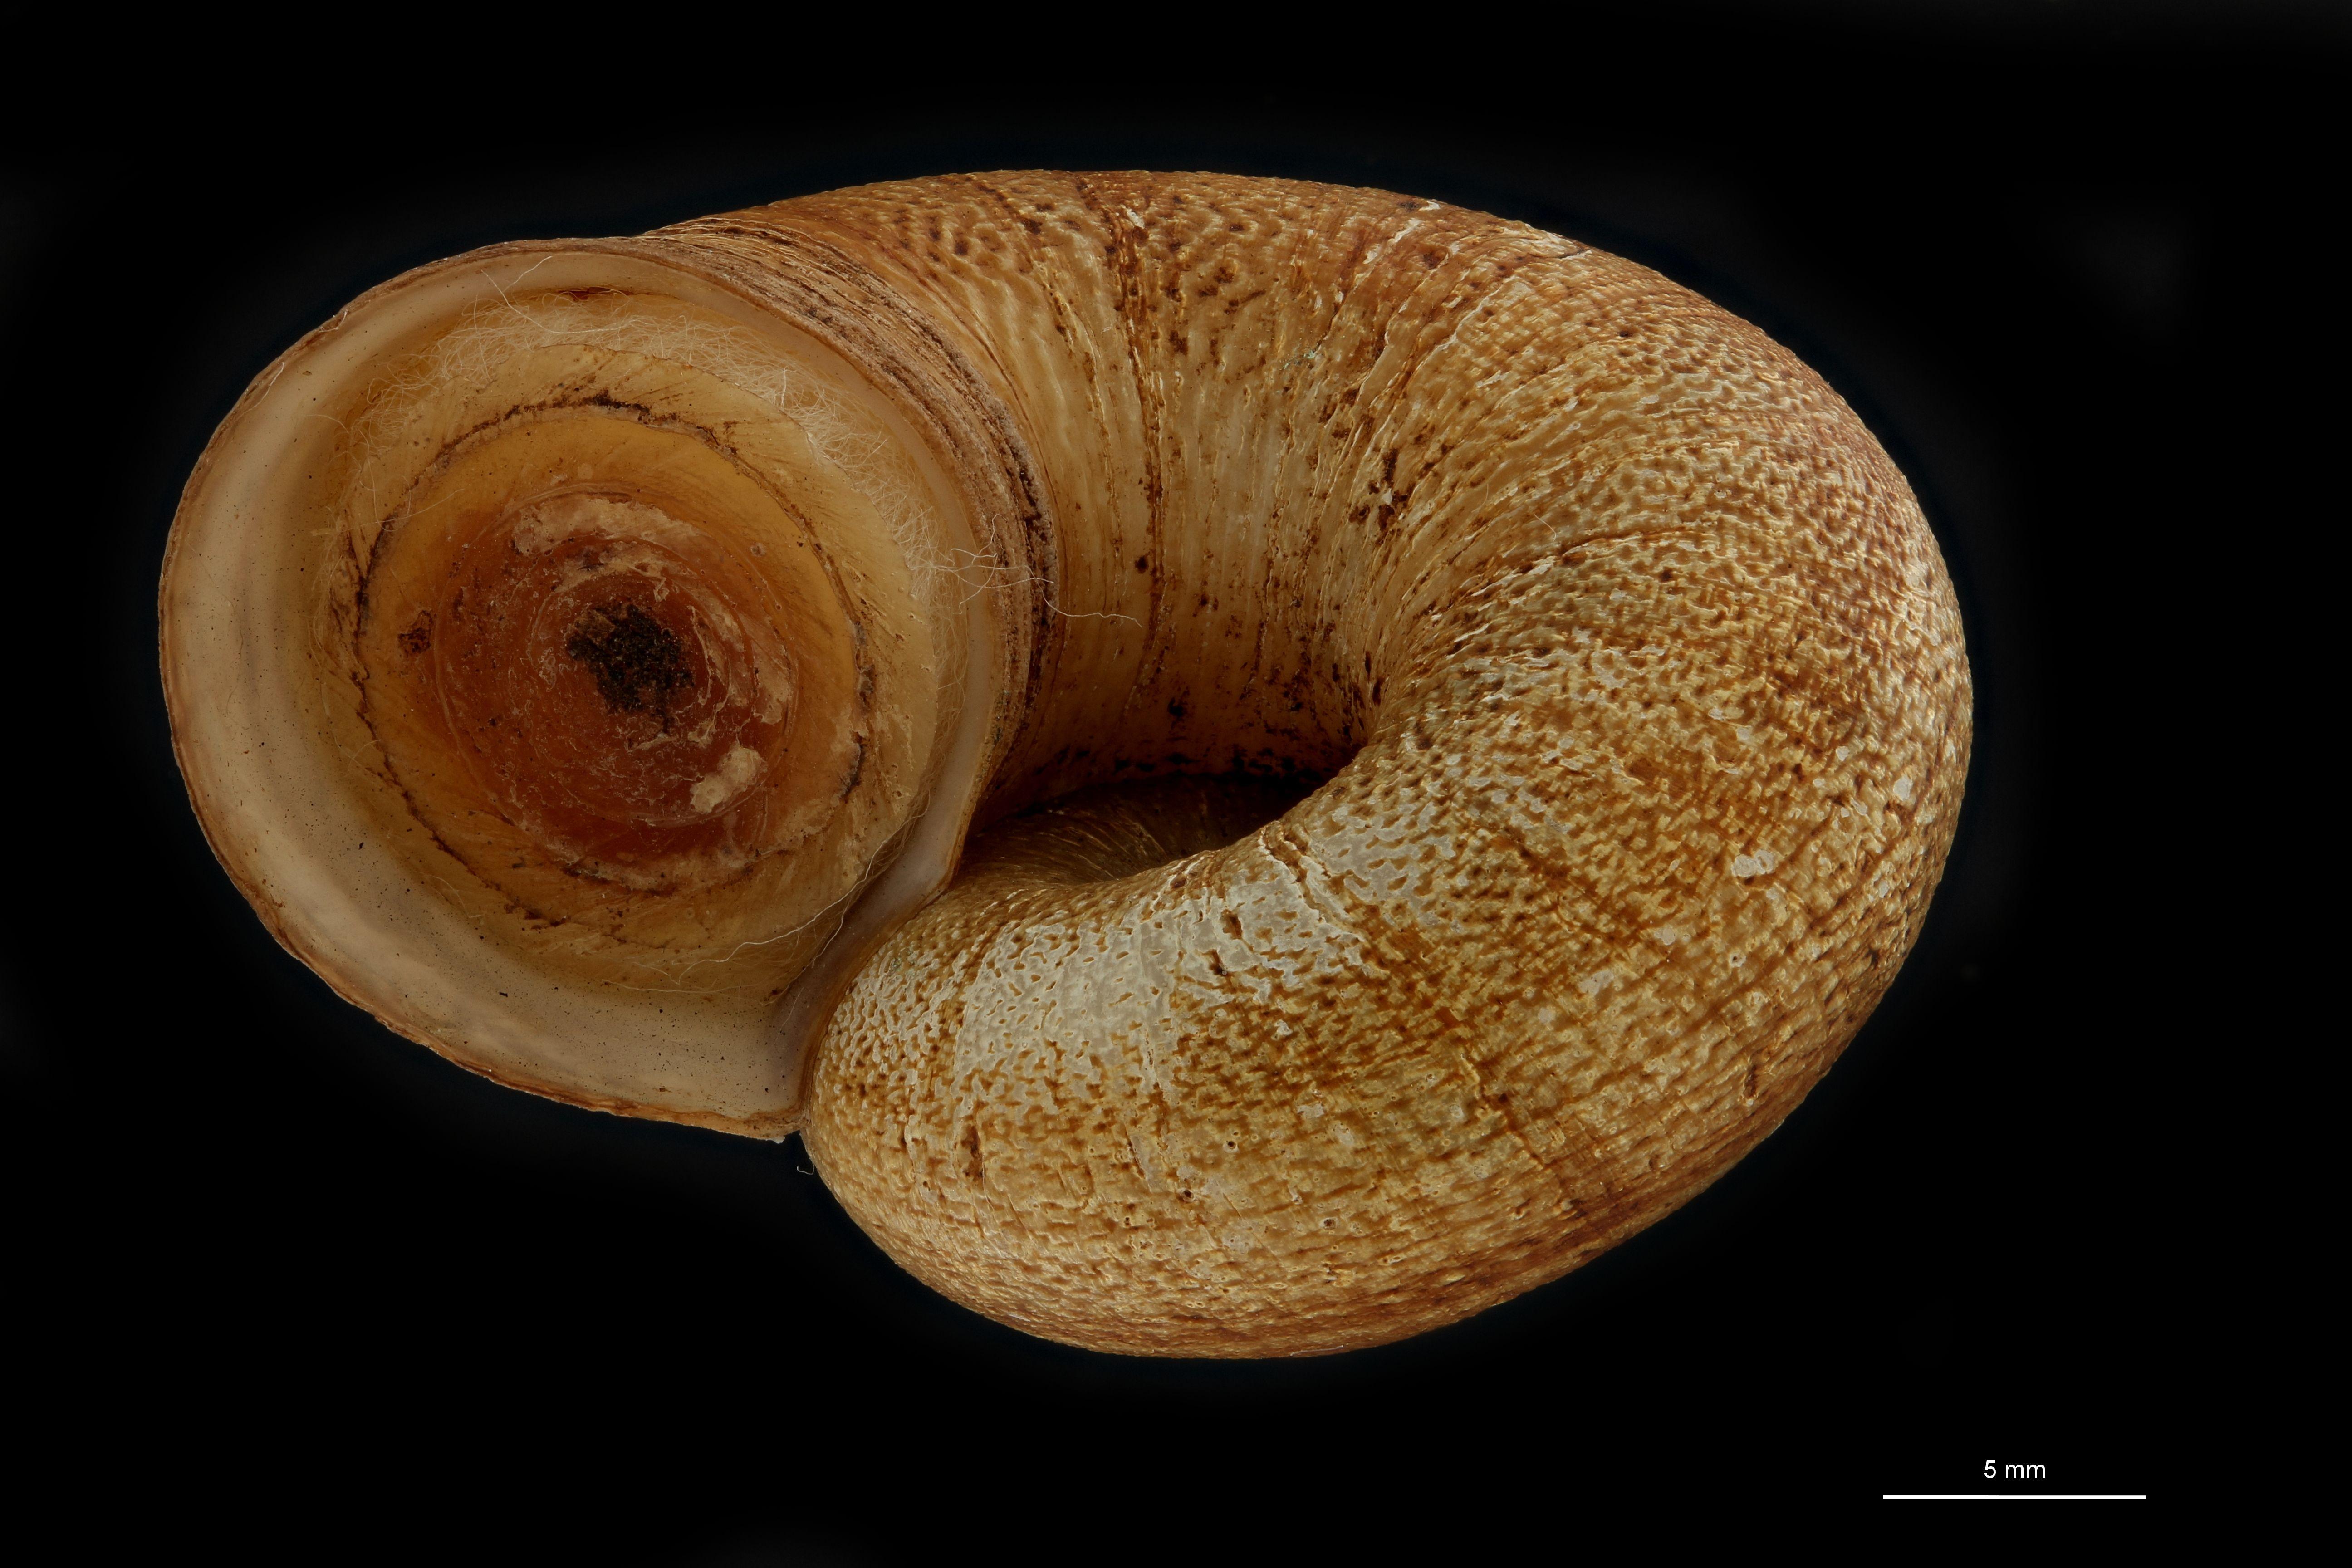 BE-RBINS-INV PARATYPE MT 947 Amphicyclotus boucardi FRONTAL.jpg